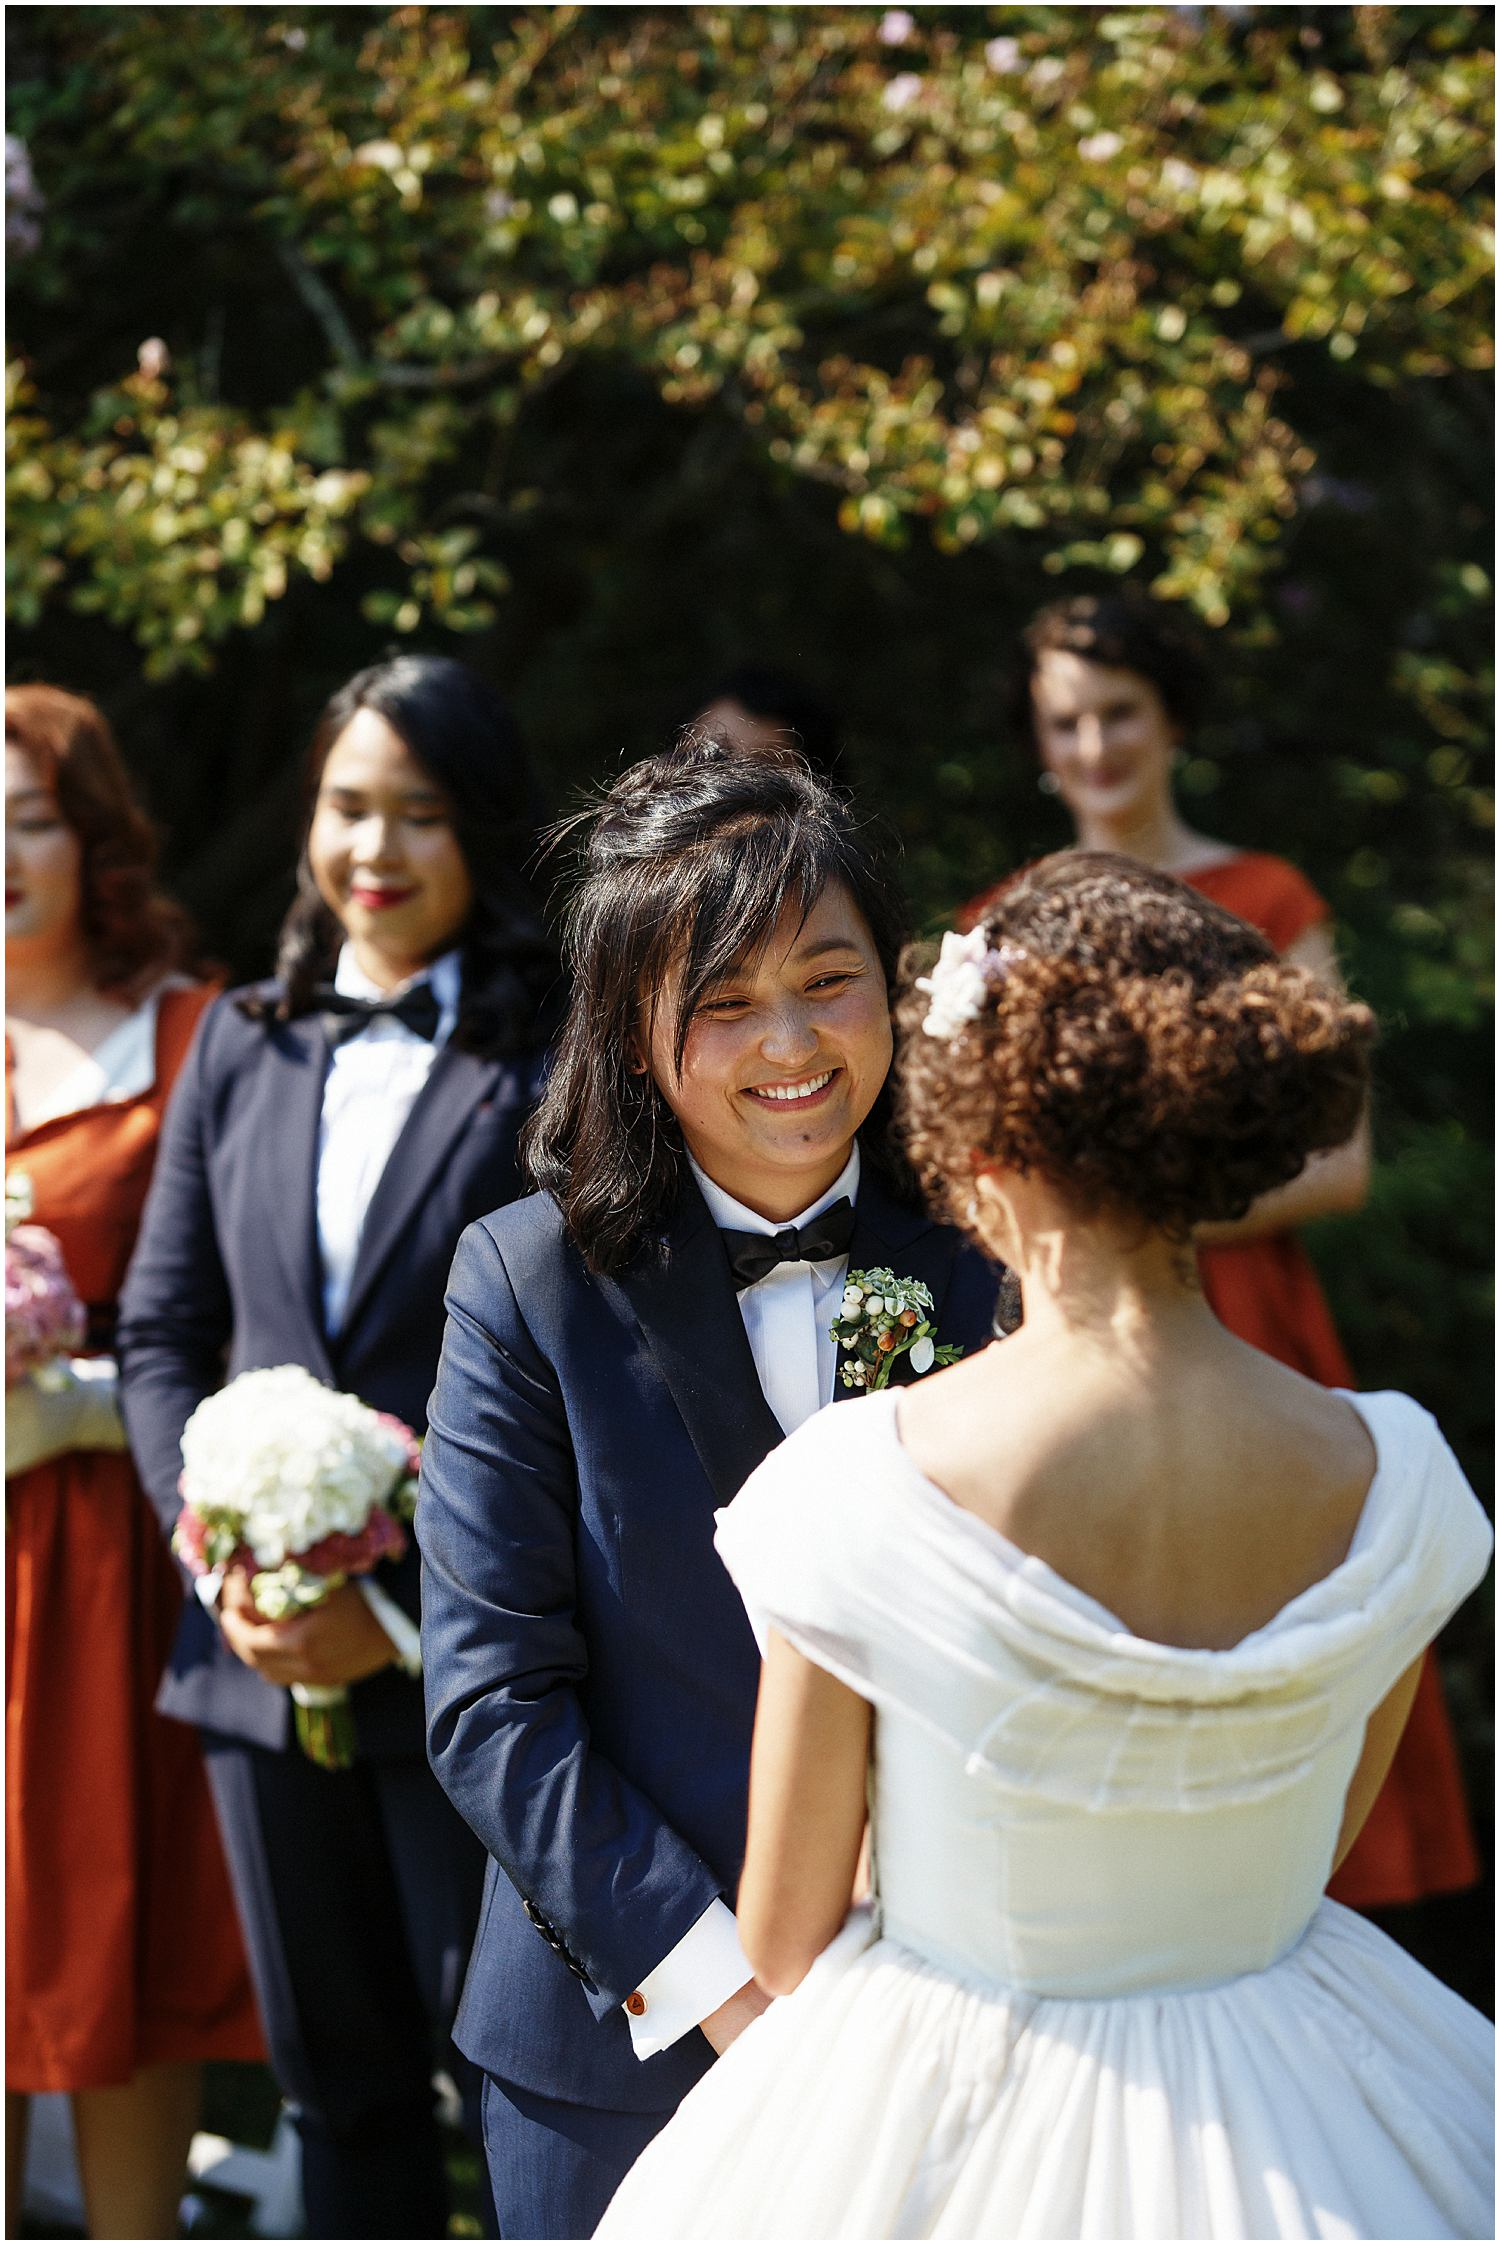 NGV botanical gardens wedding melbourne 047.jpg